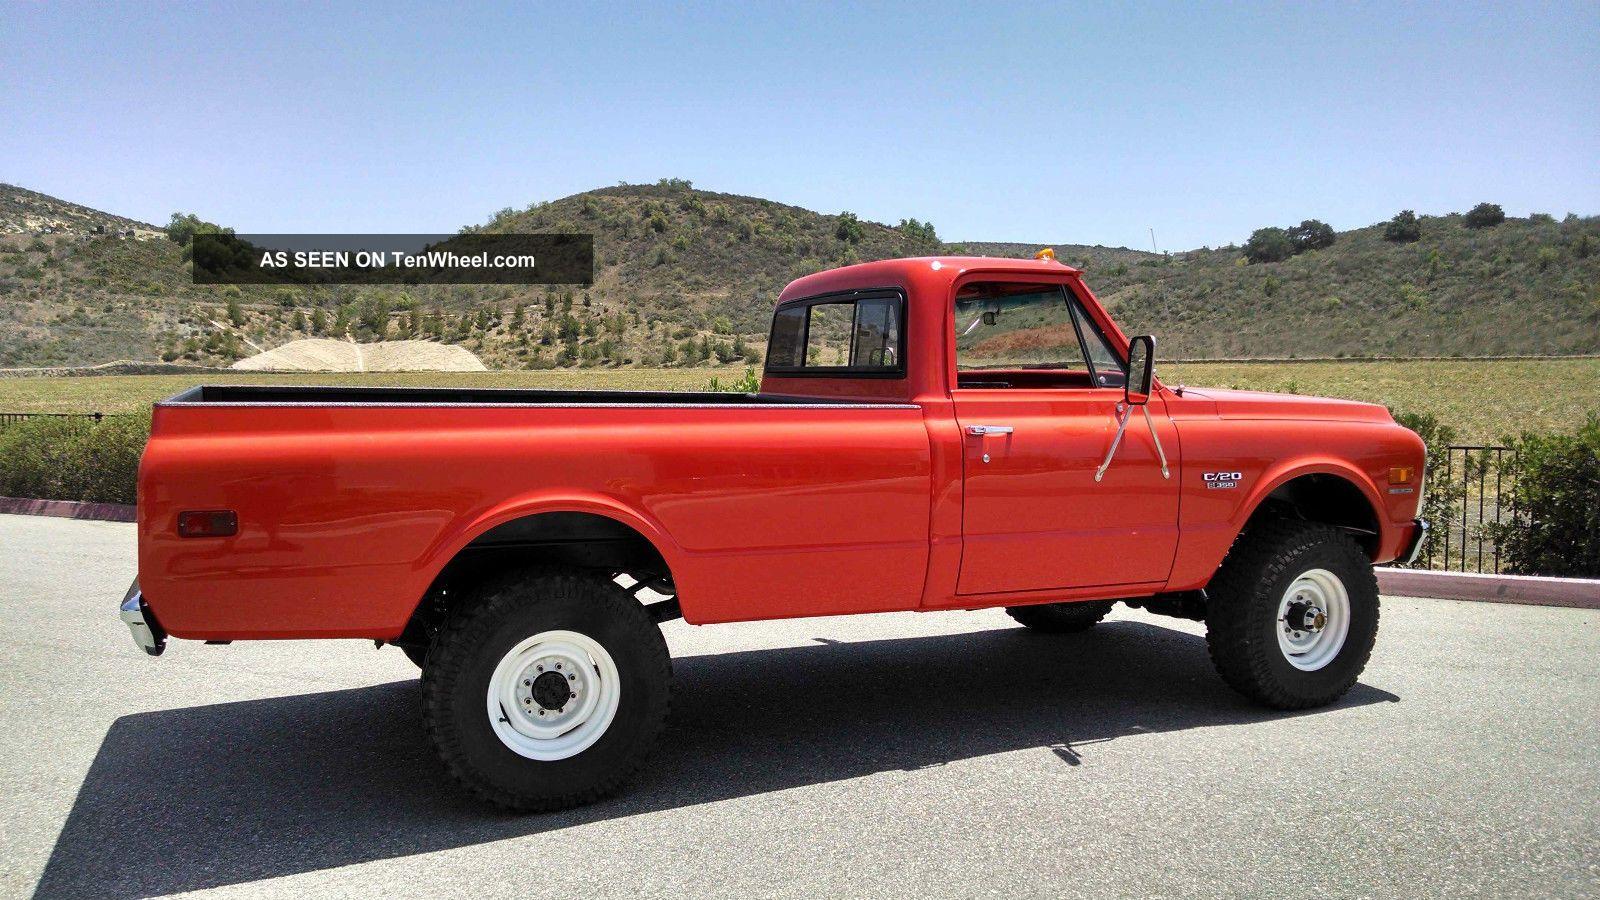 1970 chevrolet k20 c20 pickup truck fire 4x4. Black Bedroom Furniture Sets. Home Design Ideas